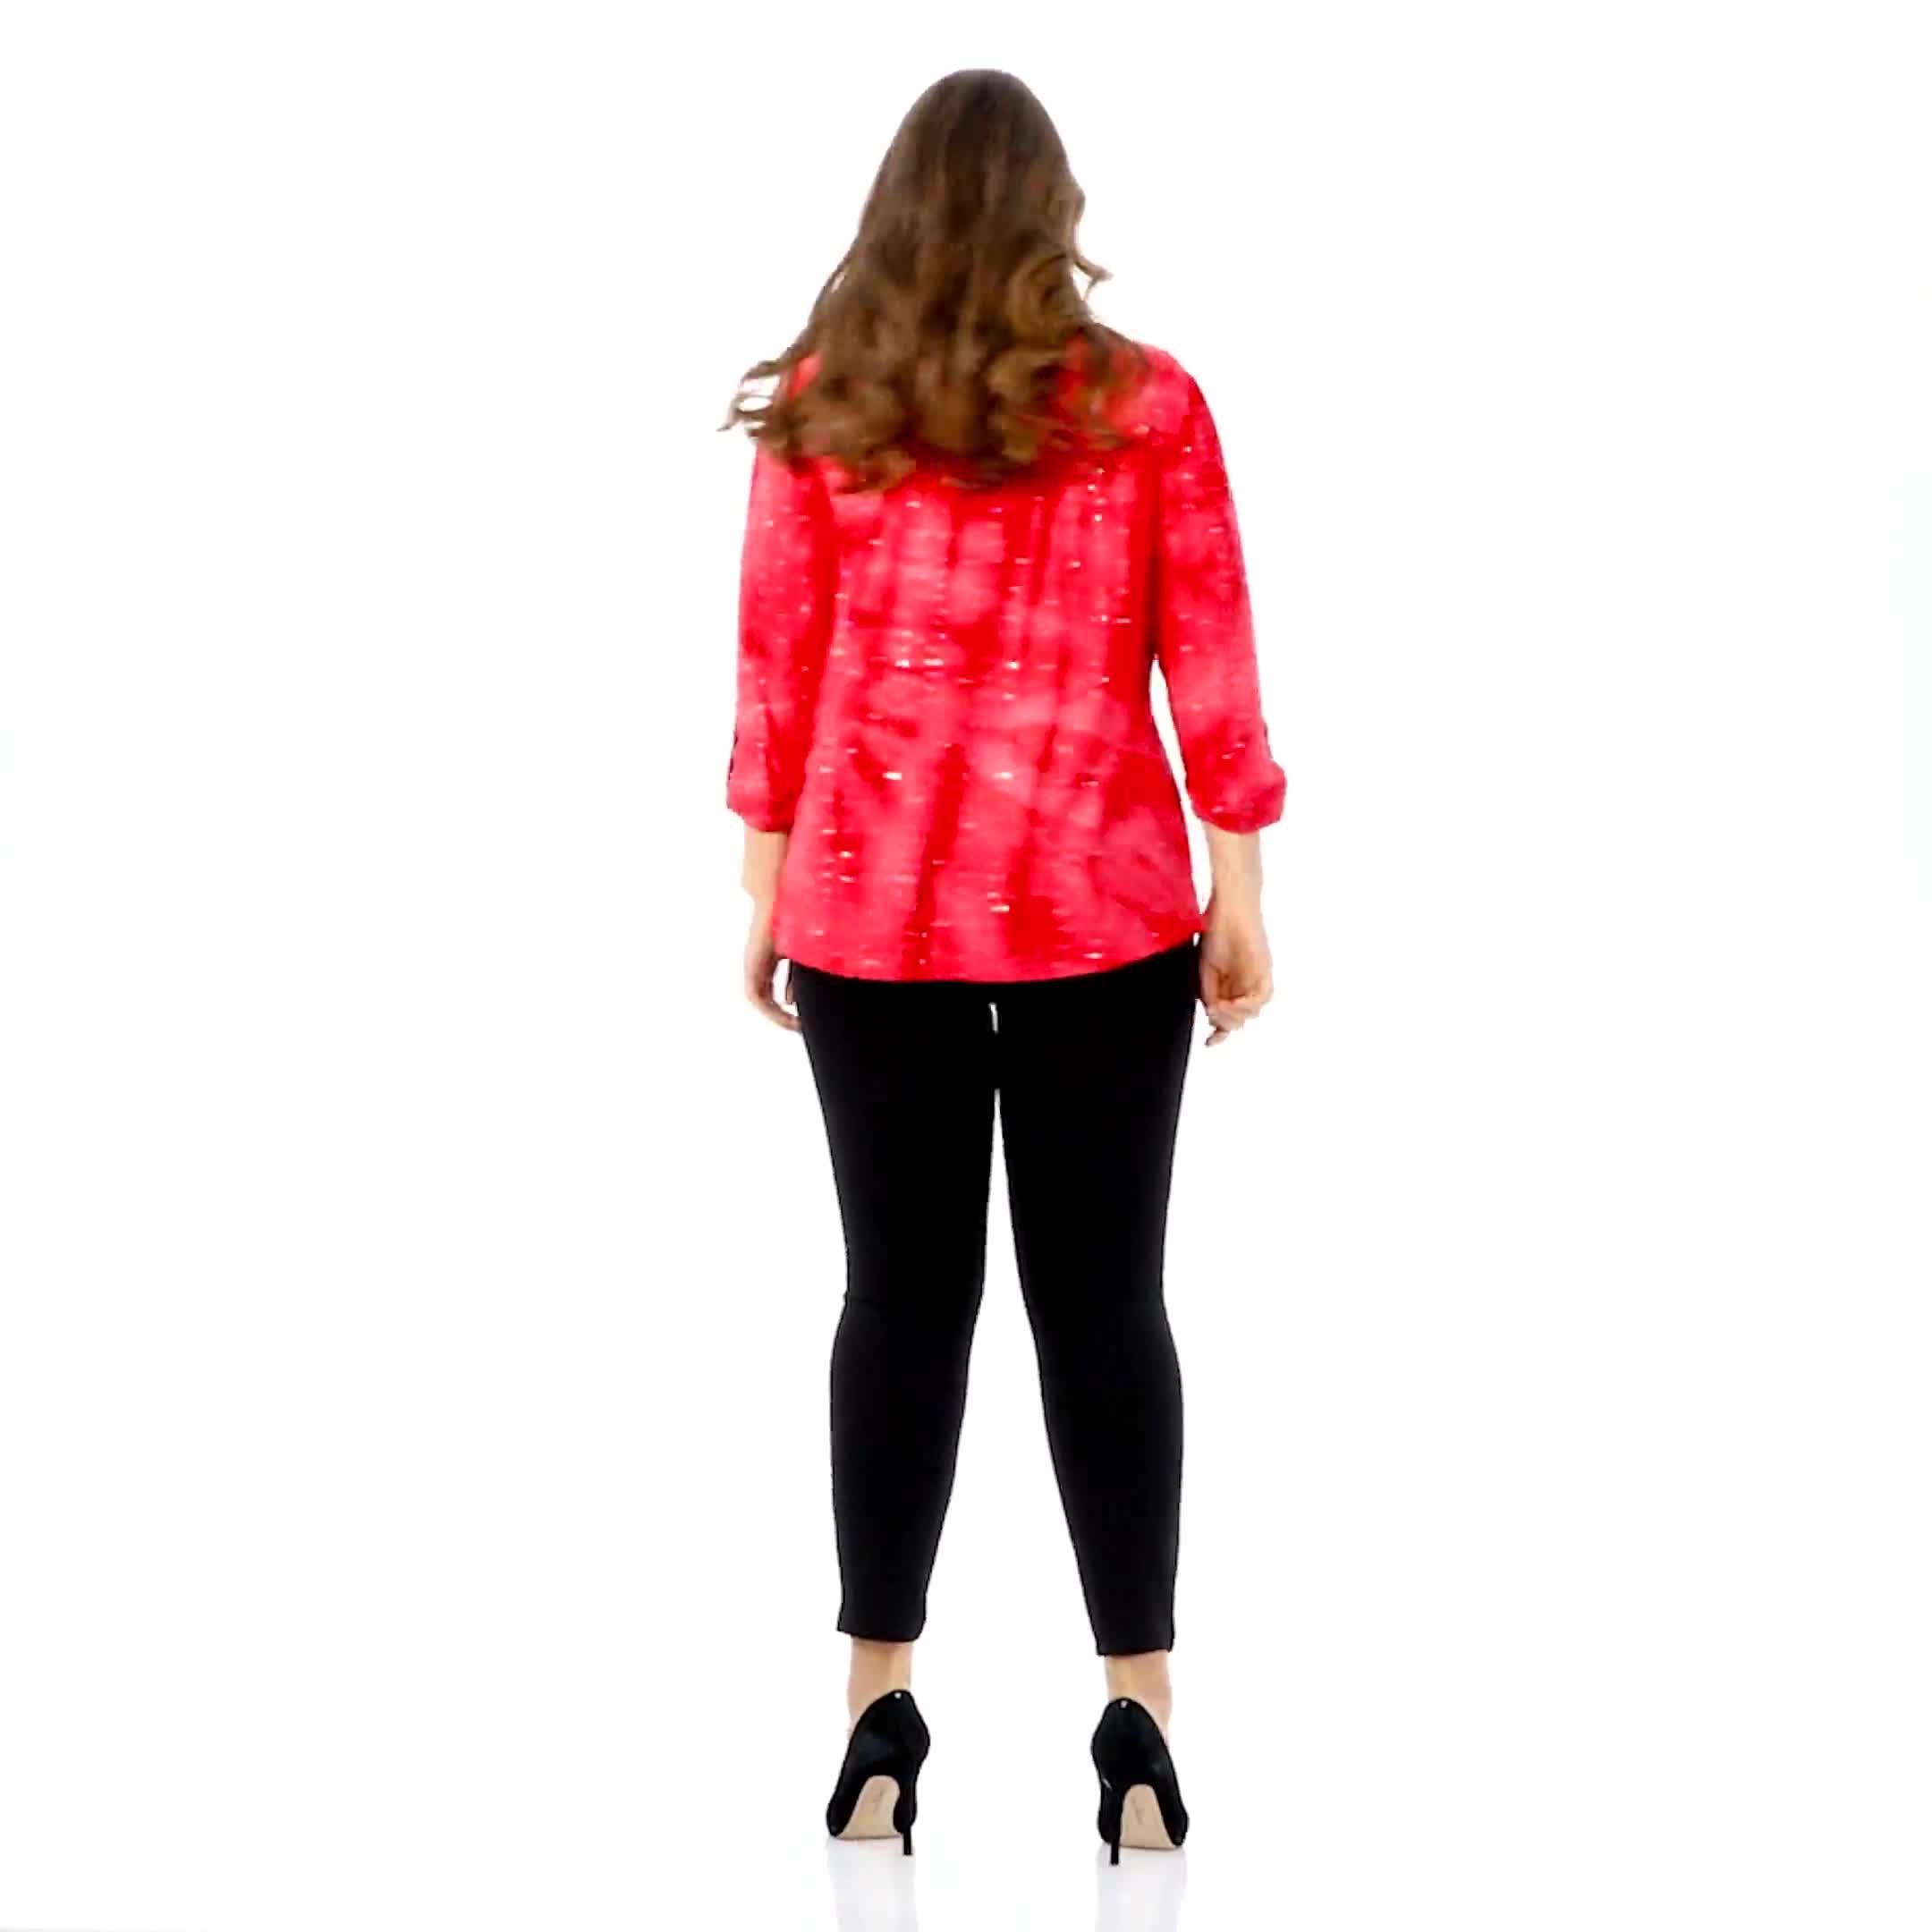 Roz & Ali Red Sequin Tie Dye Popover - Plus - Video